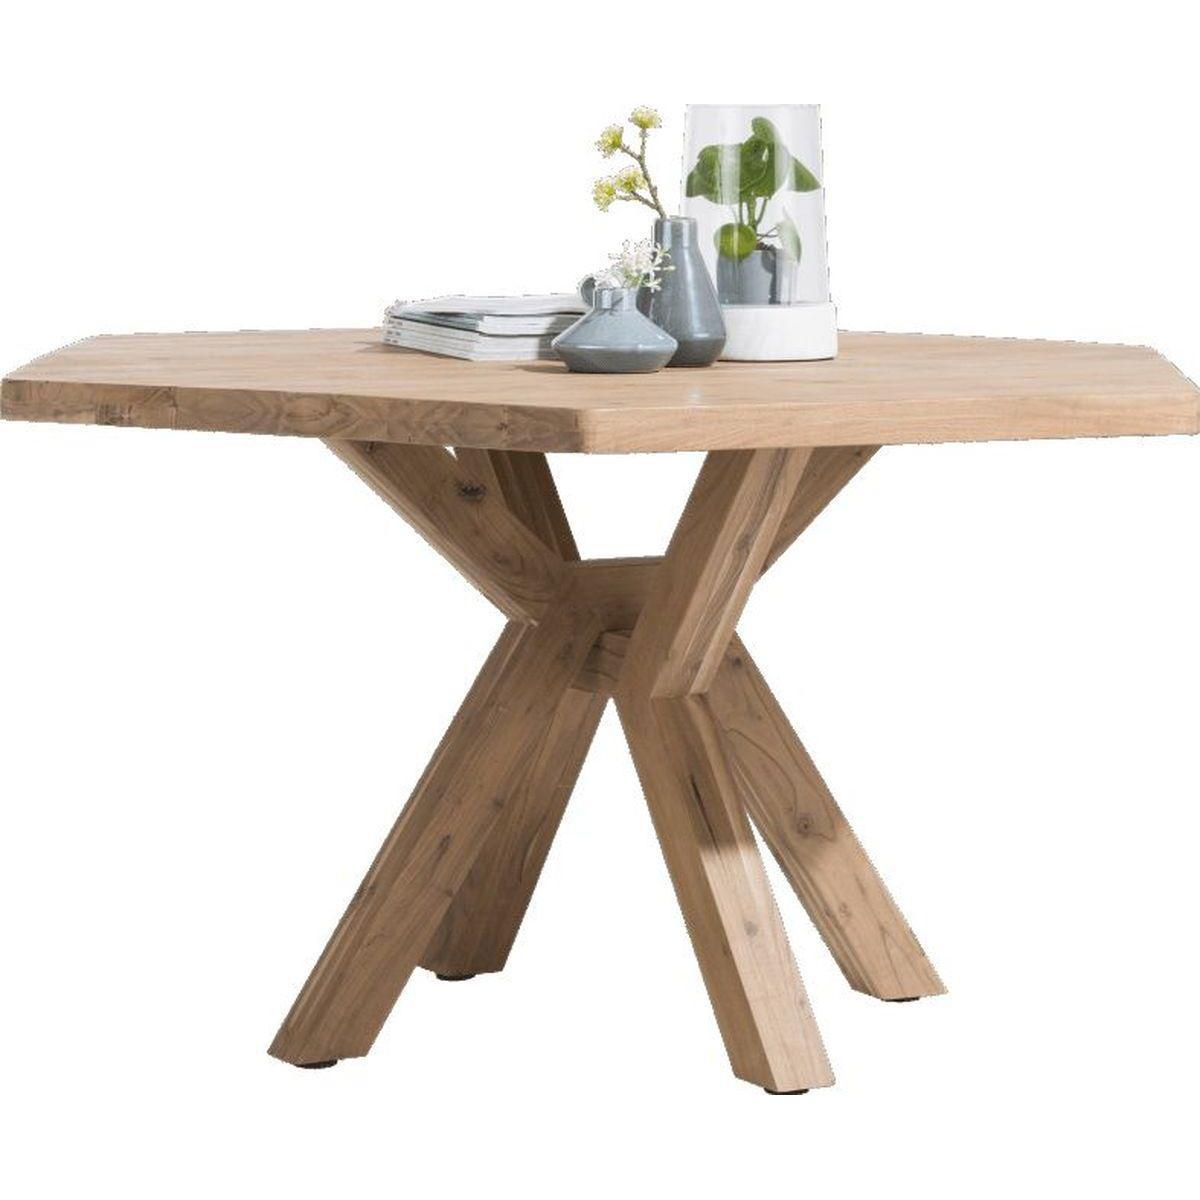 Table QUEBEC HetH 150x130cm pieds en bois